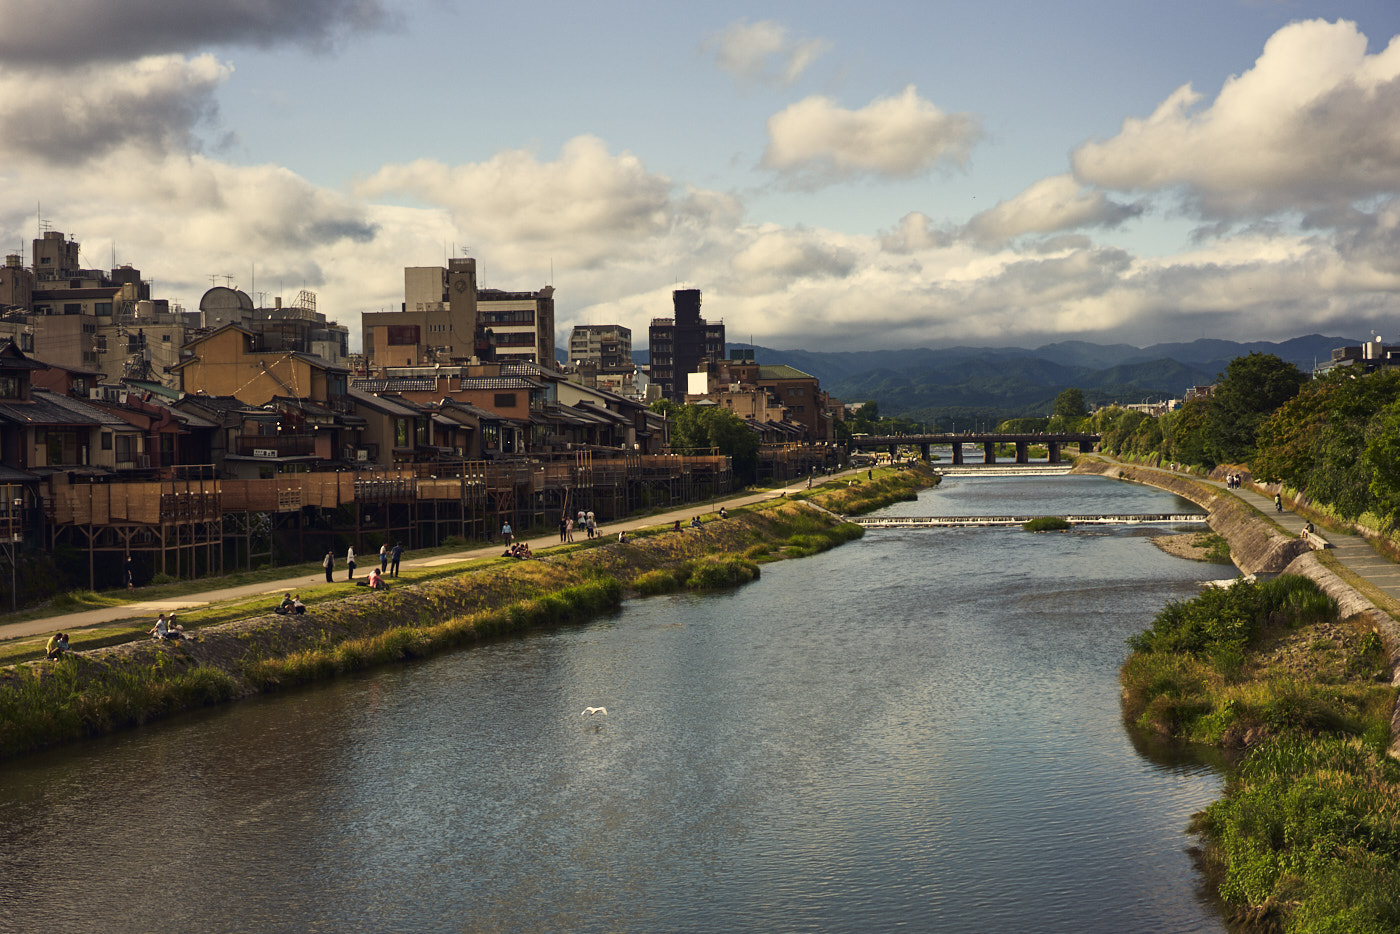 japan_2018_kyoto_raw 233_klein.jpg